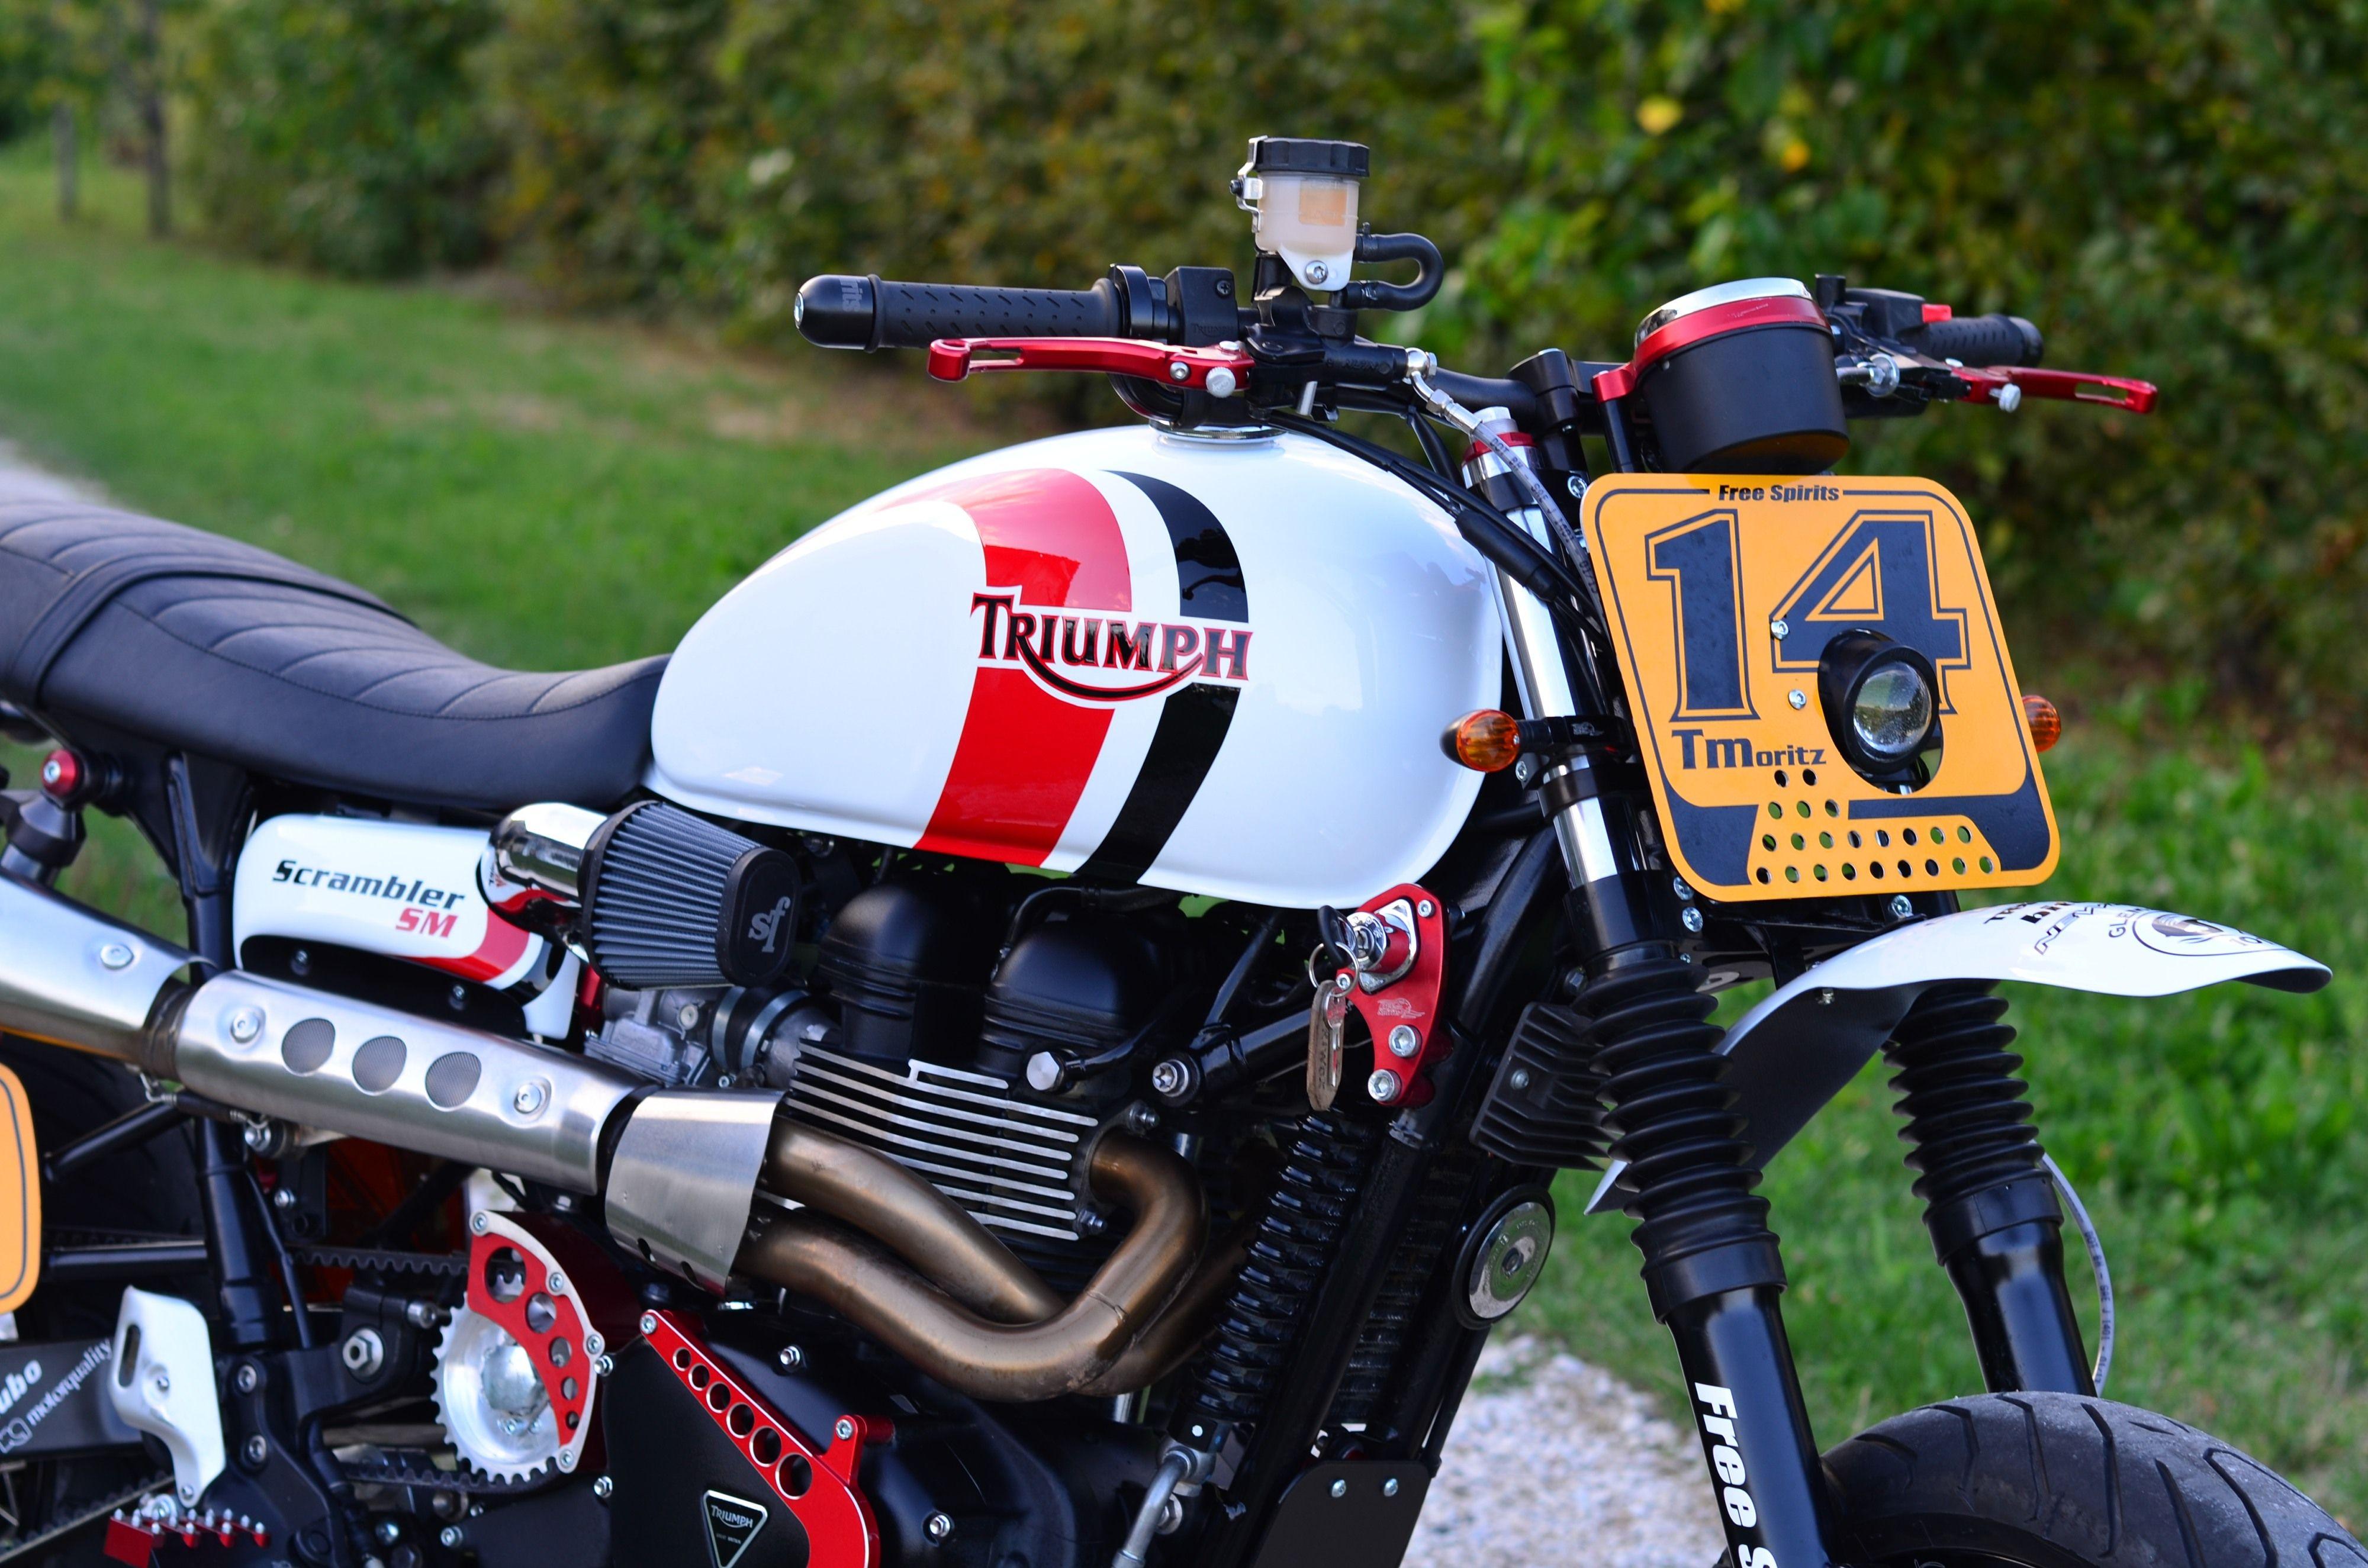 Triumph Scrambler Supermotard born from a Bonneville tuned